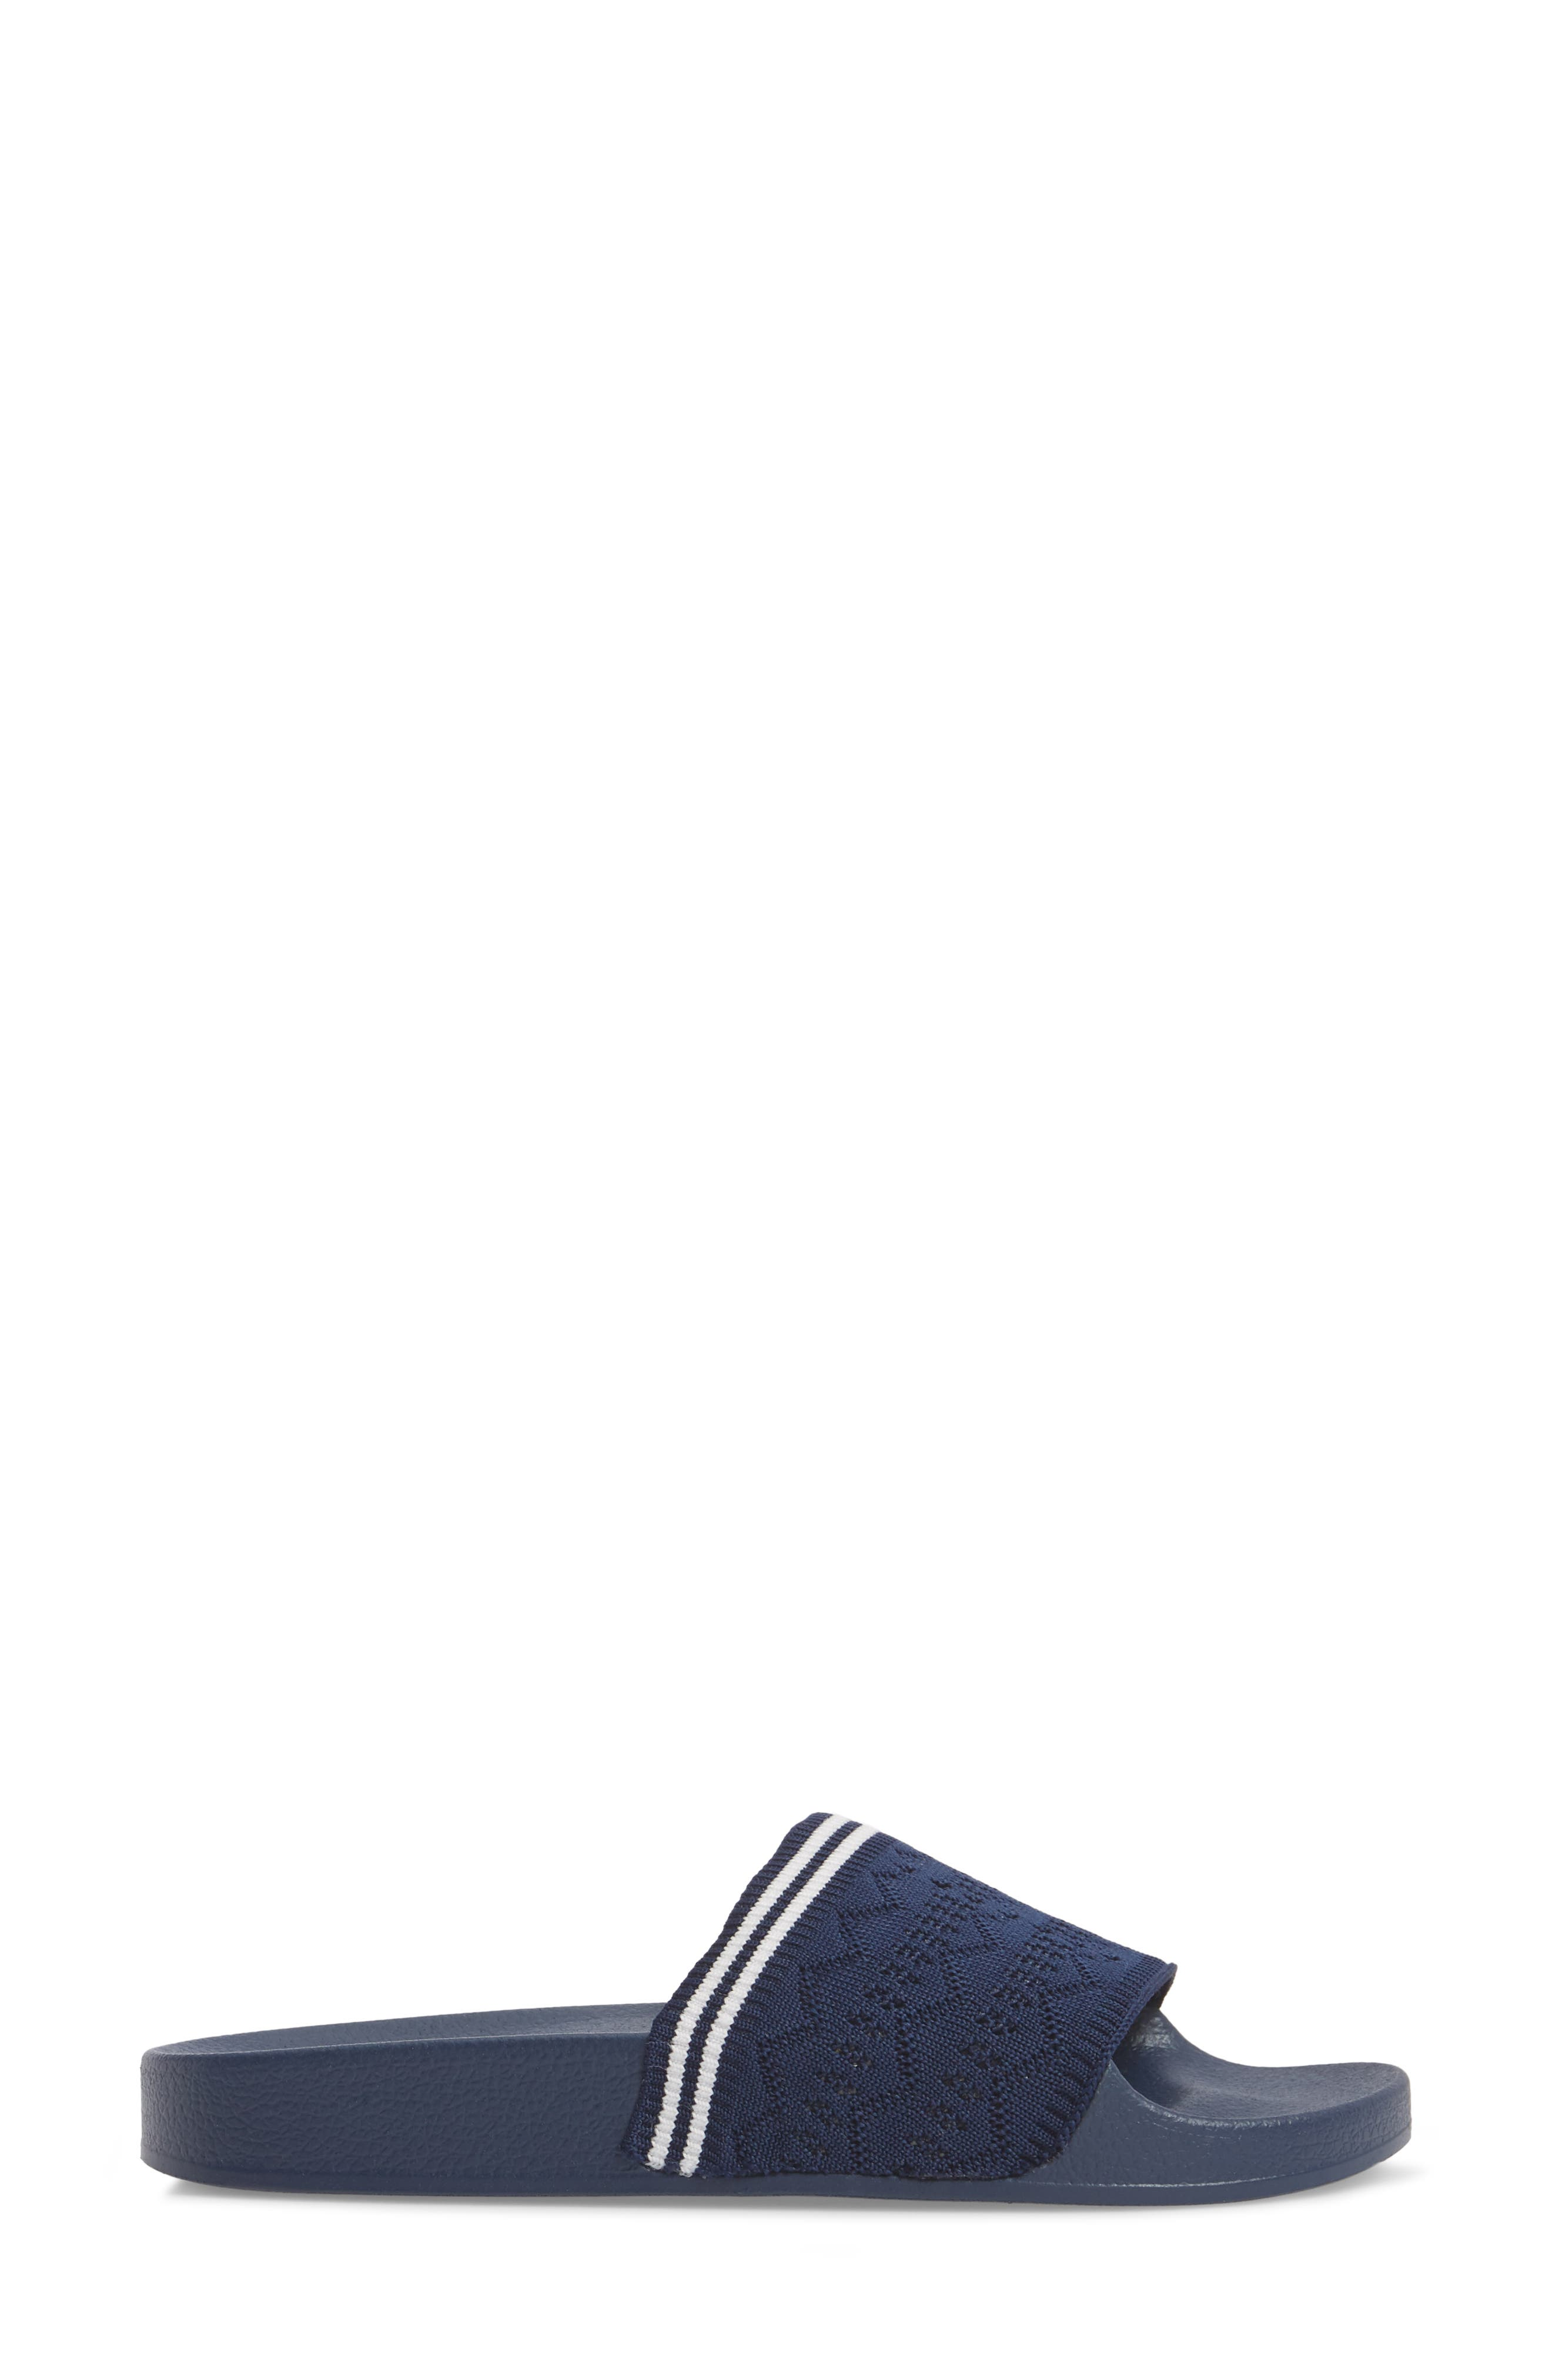 Vibe Sock Knit Slide Sandal,                             Alternate thumbnail 13, color,